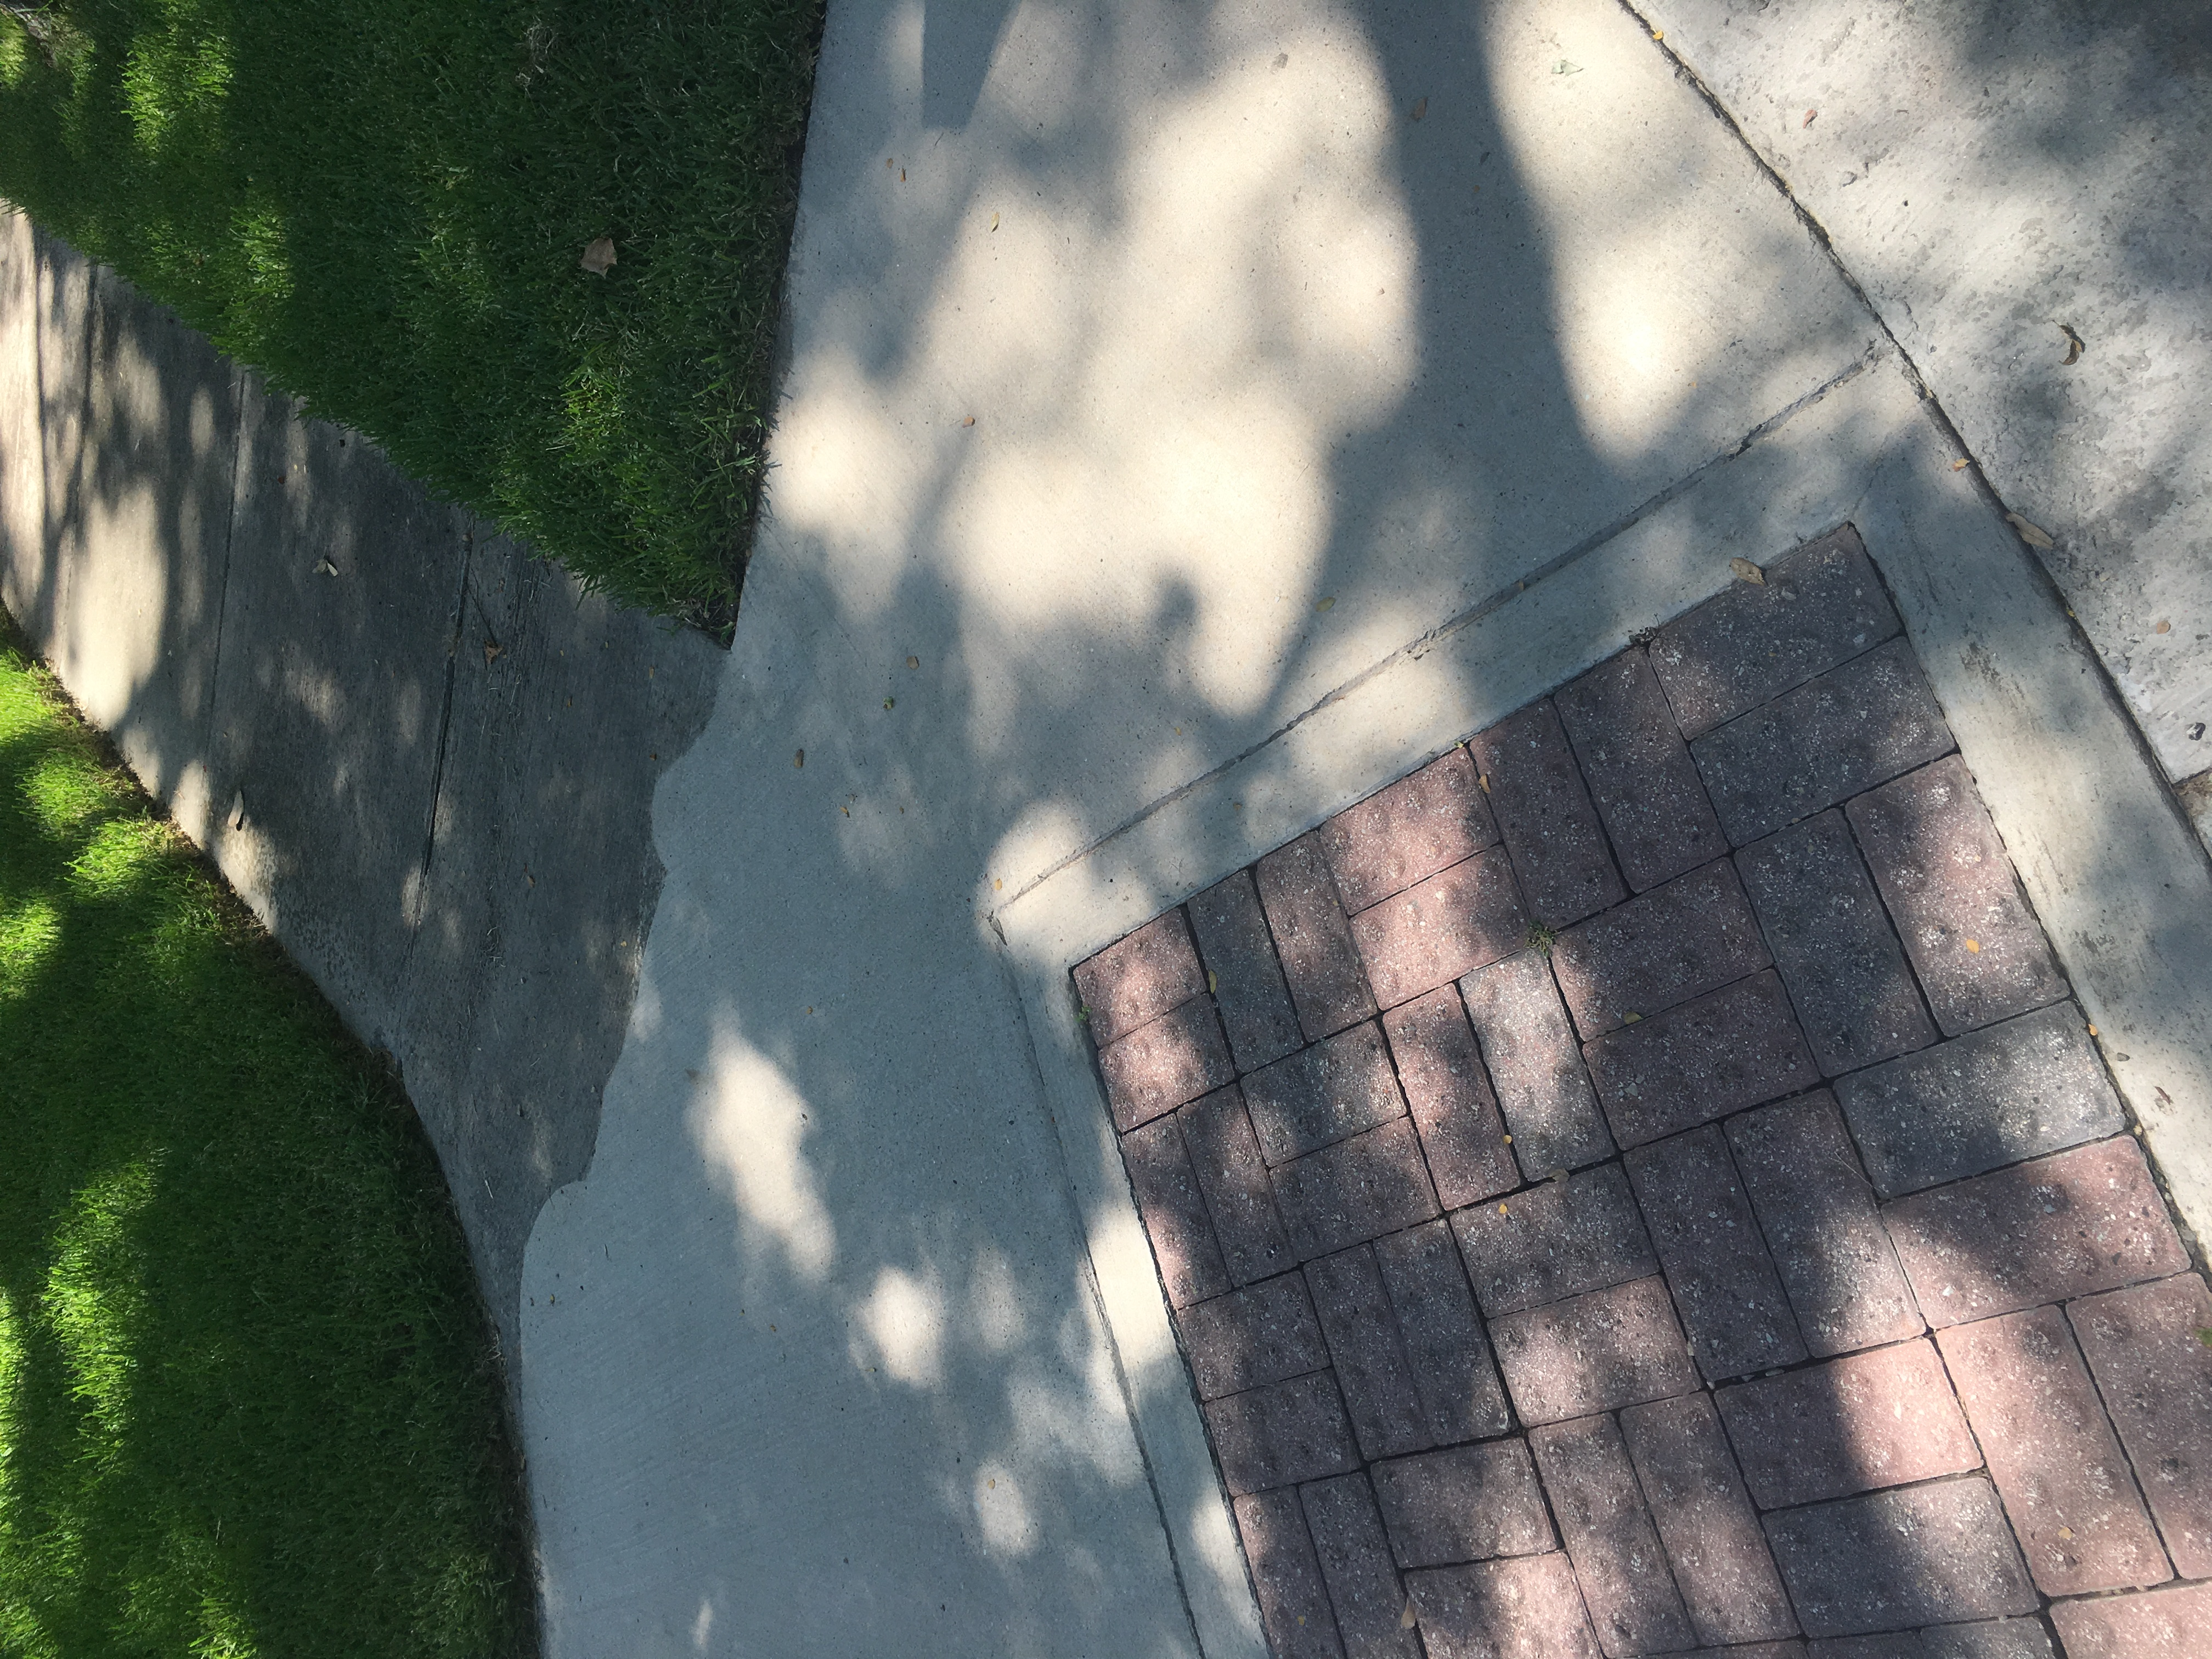 Pressure washing sidewalk